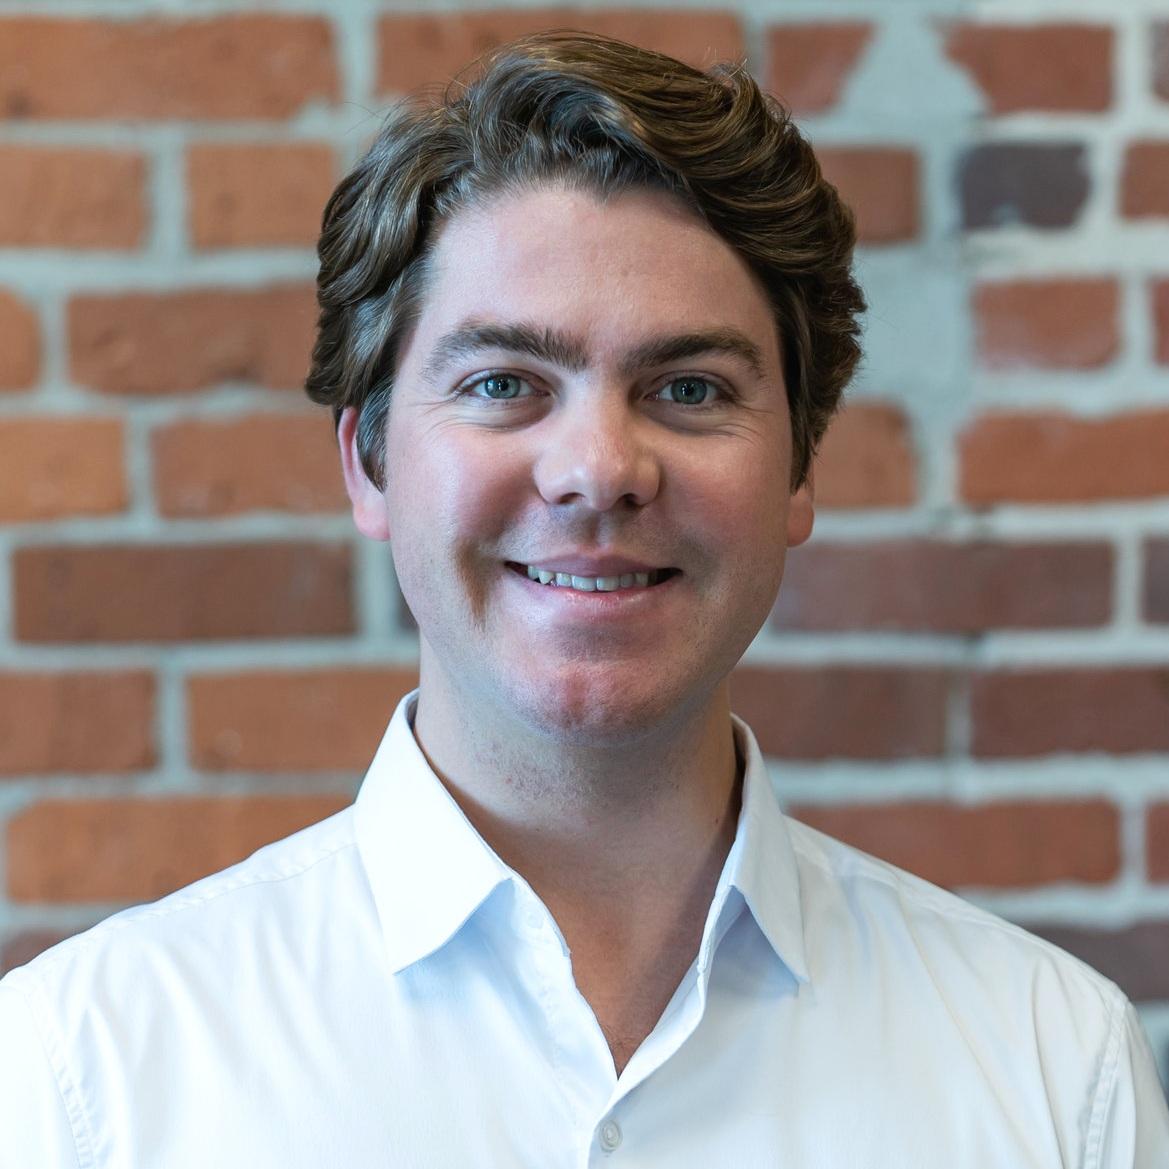 Patrick Duffy, Blockchain in Transport Alliance (BiTA)